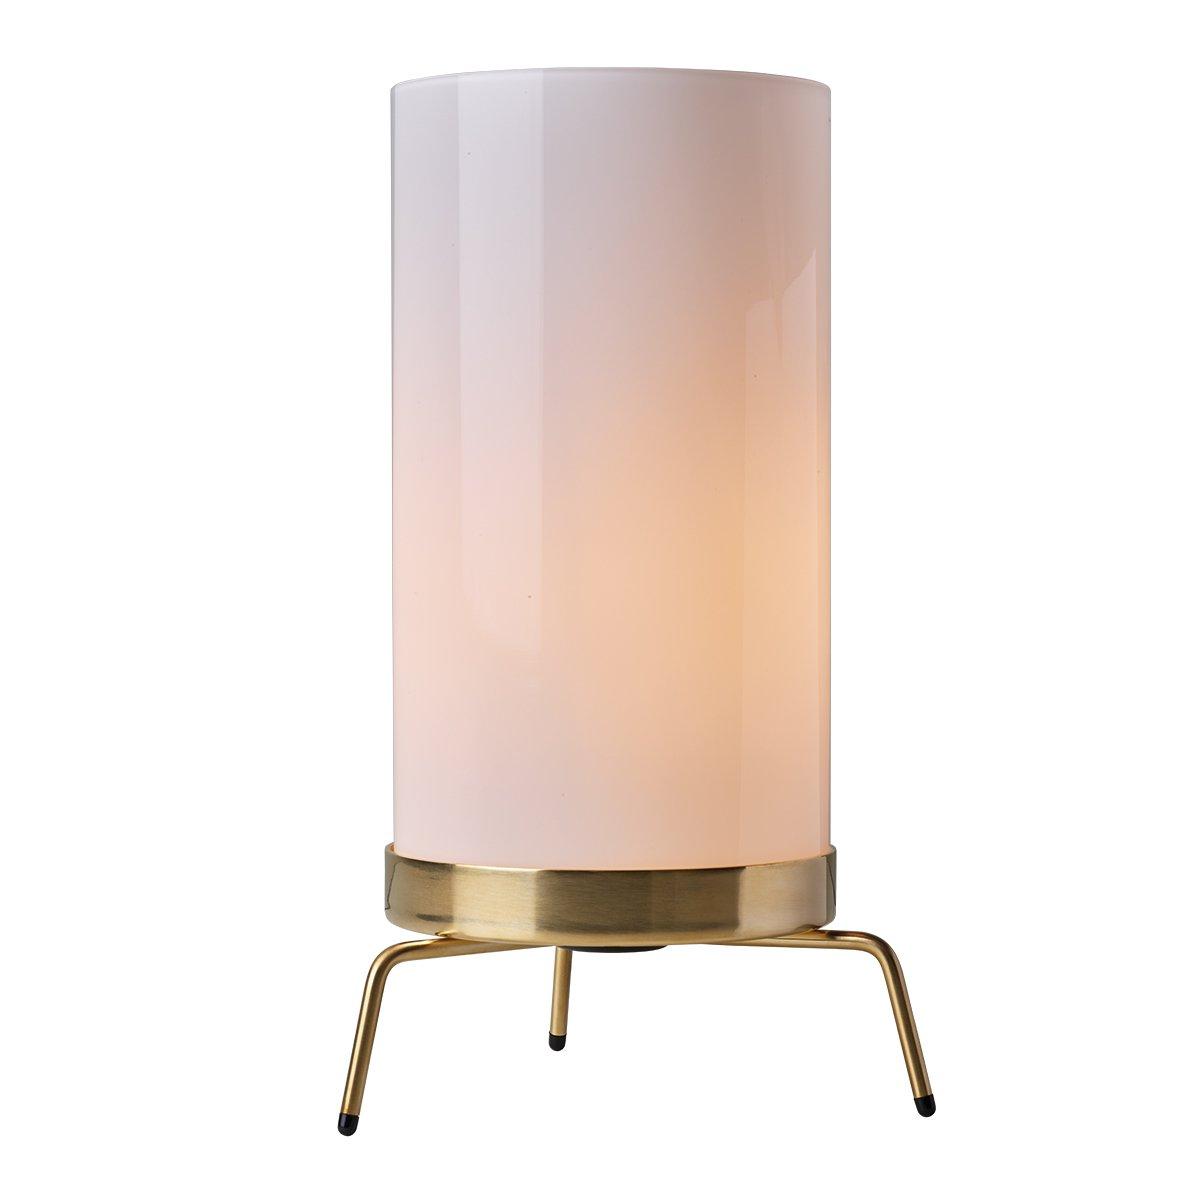 Fritz Hansen Paul McCobb PM-02 Tafellamp